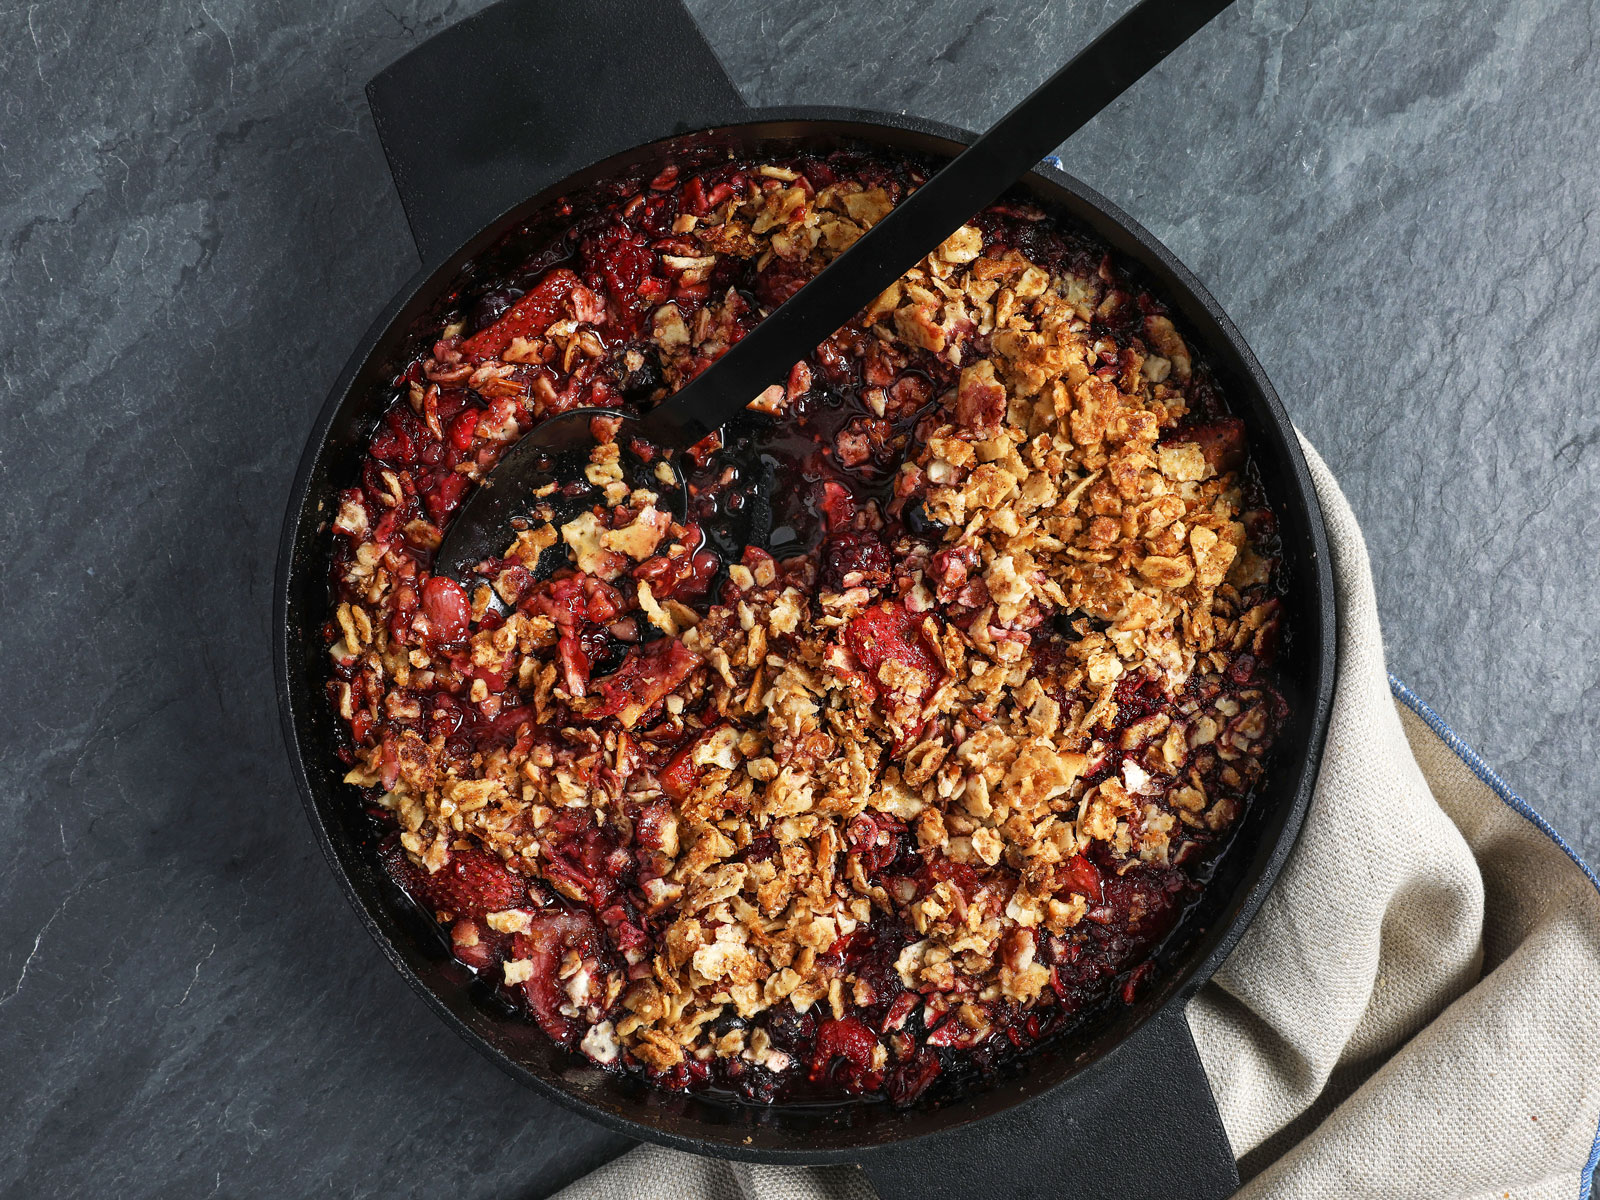 Abby Hocking – mixed berry crisp